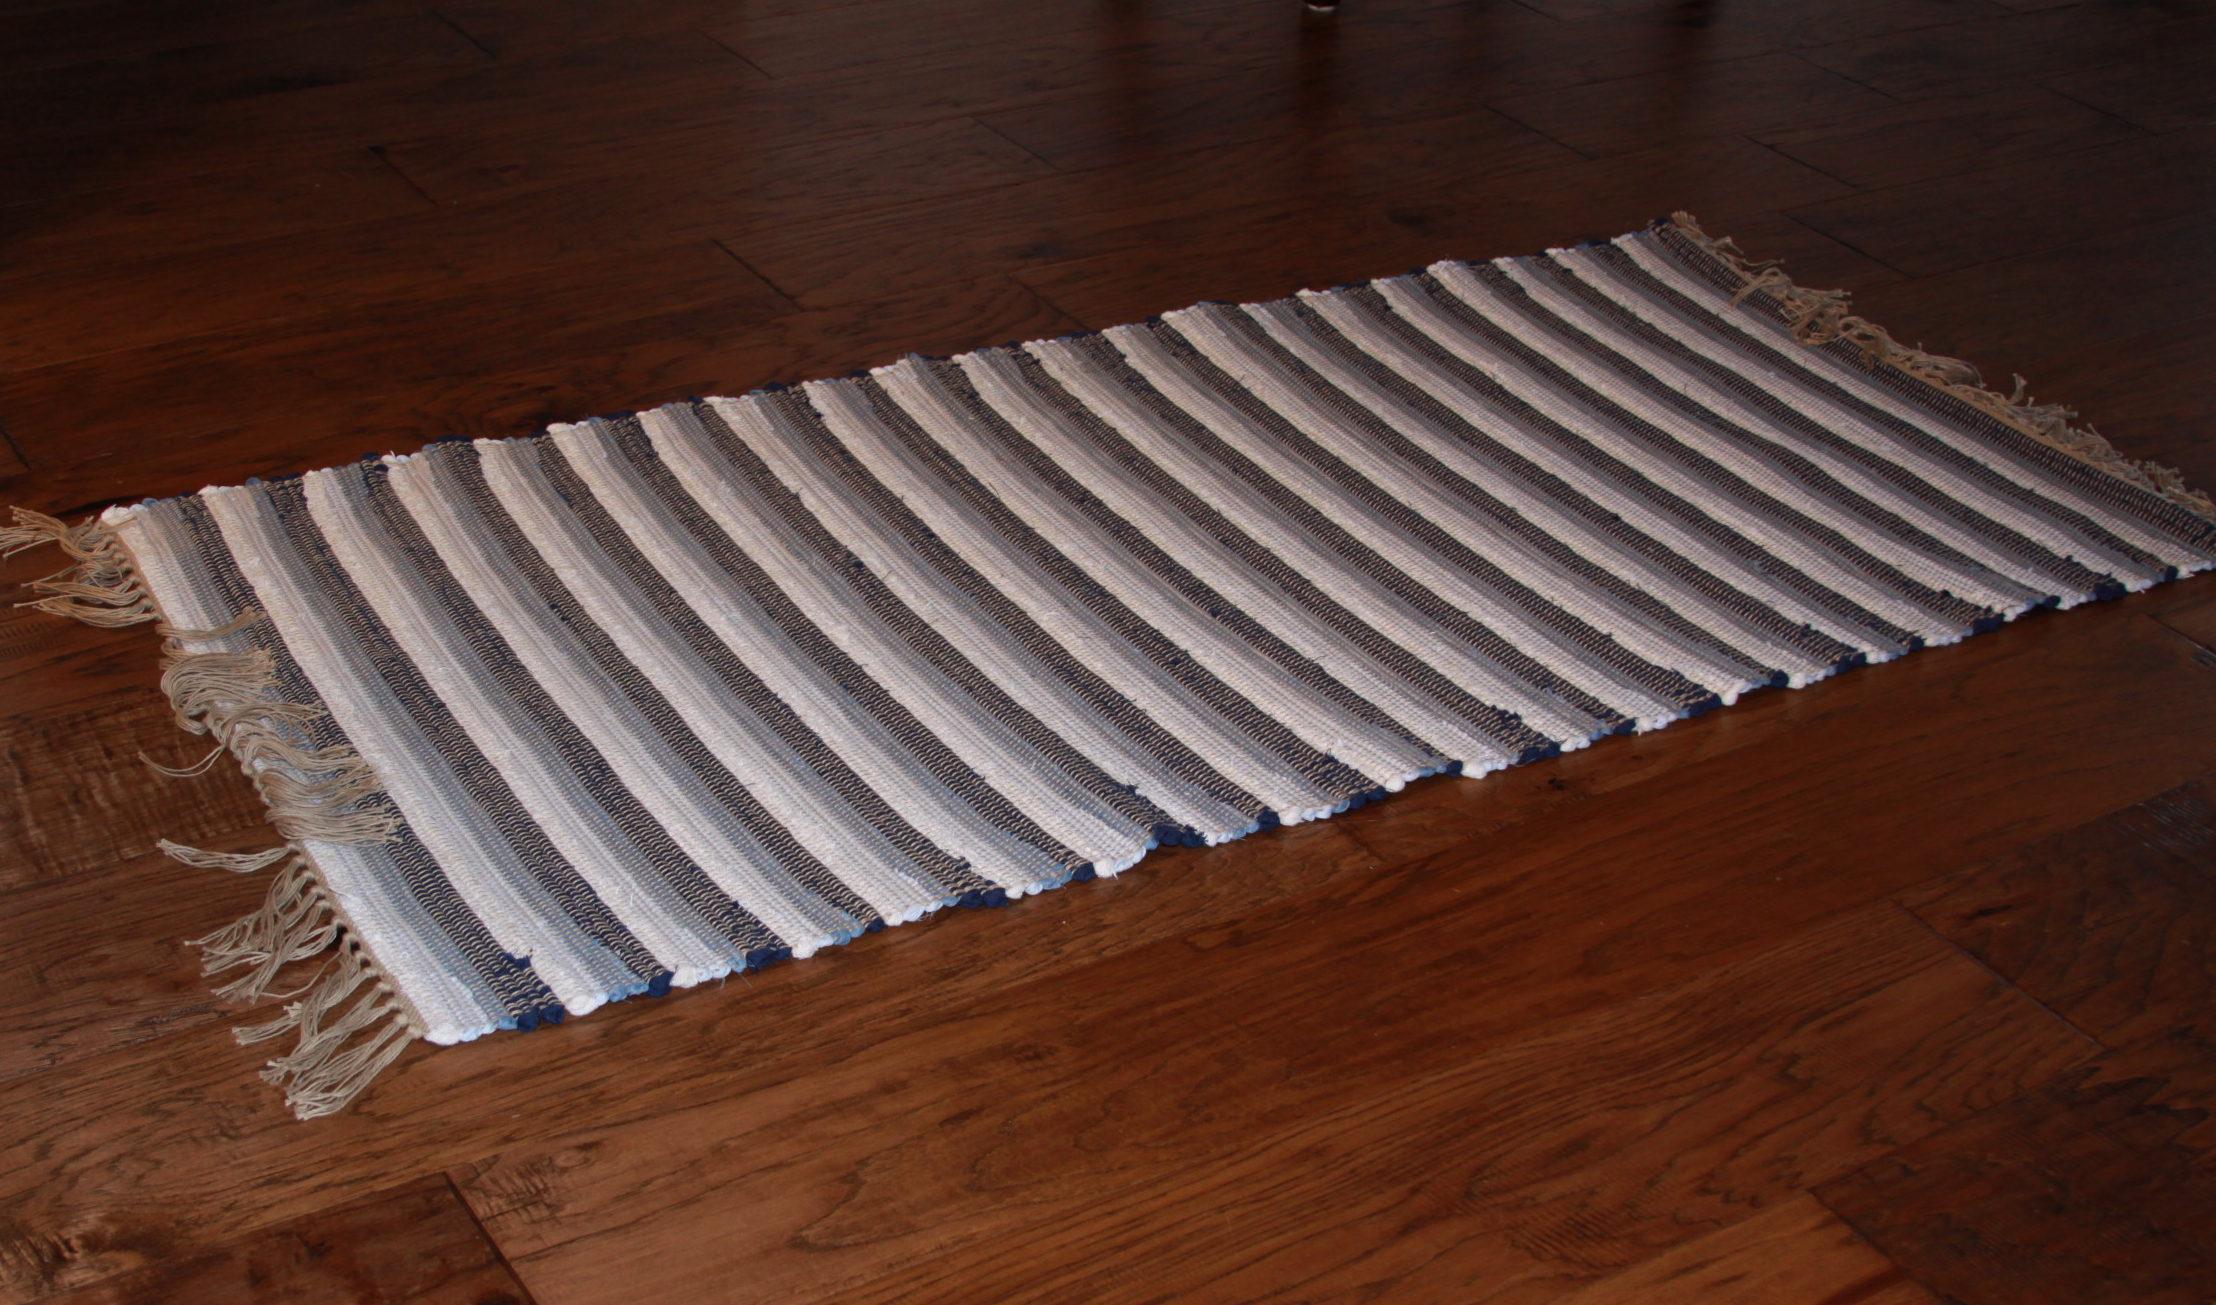 Image of a rag rug